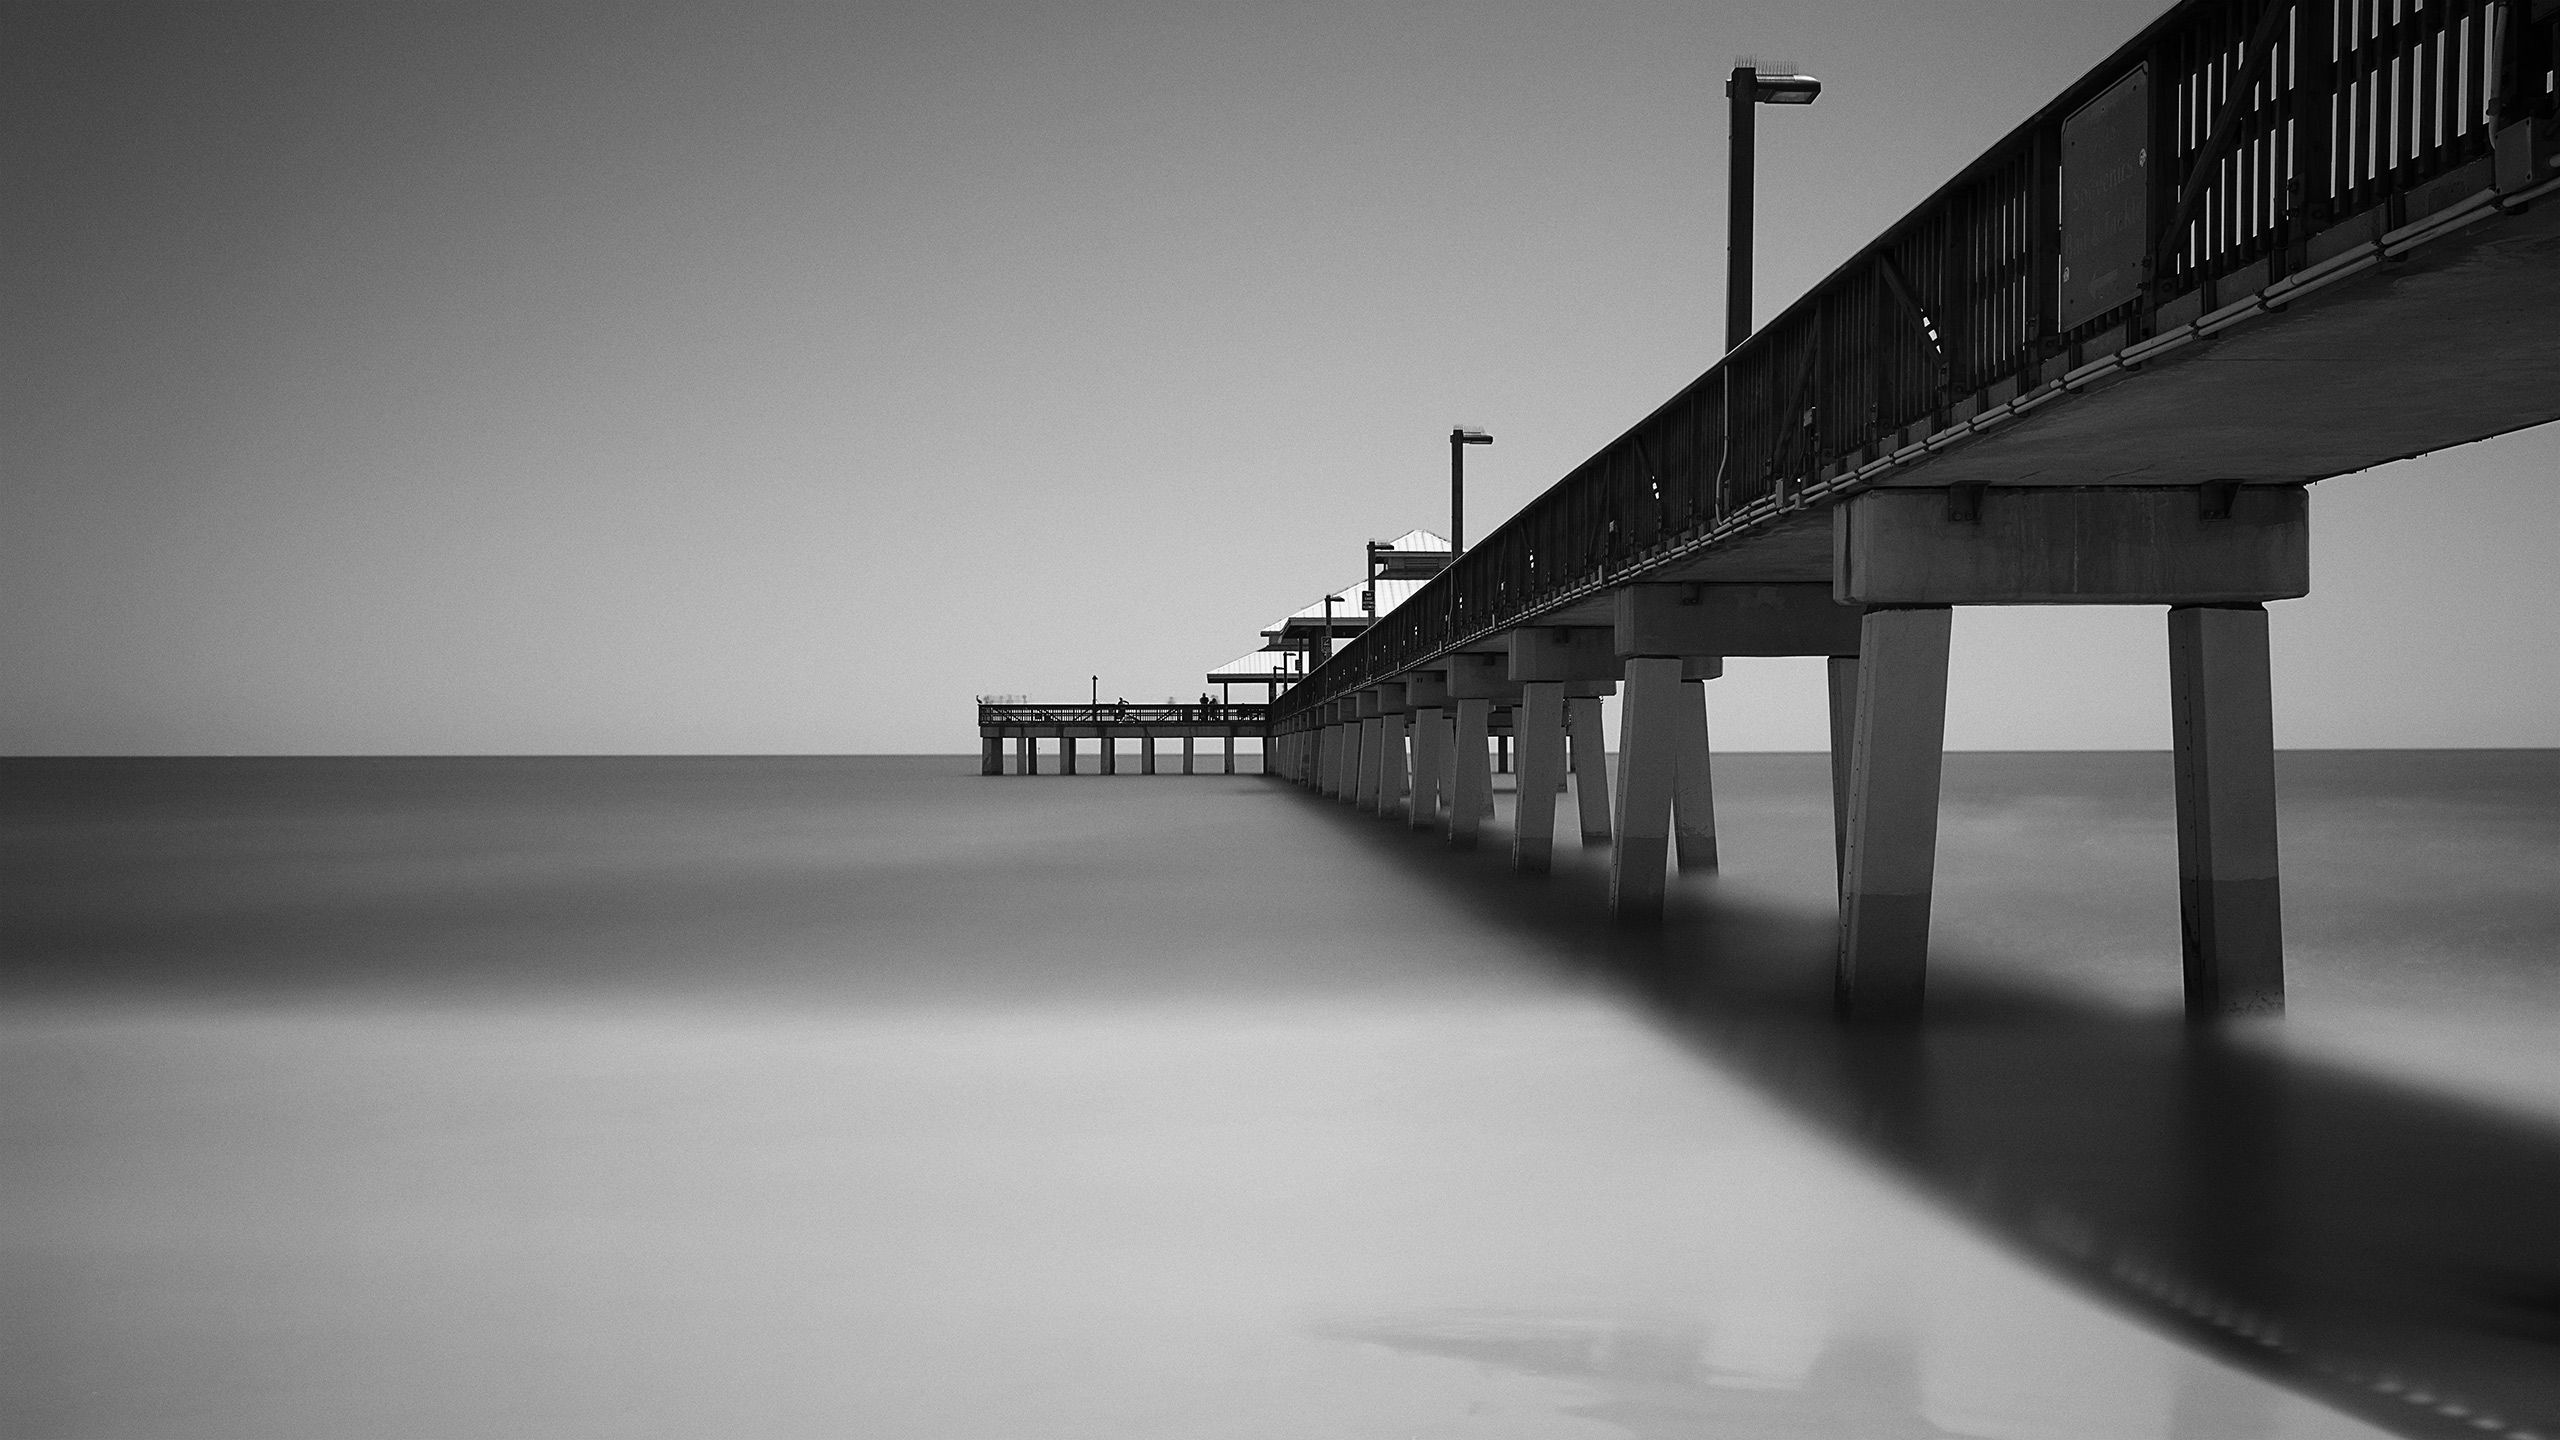 Pier Lines